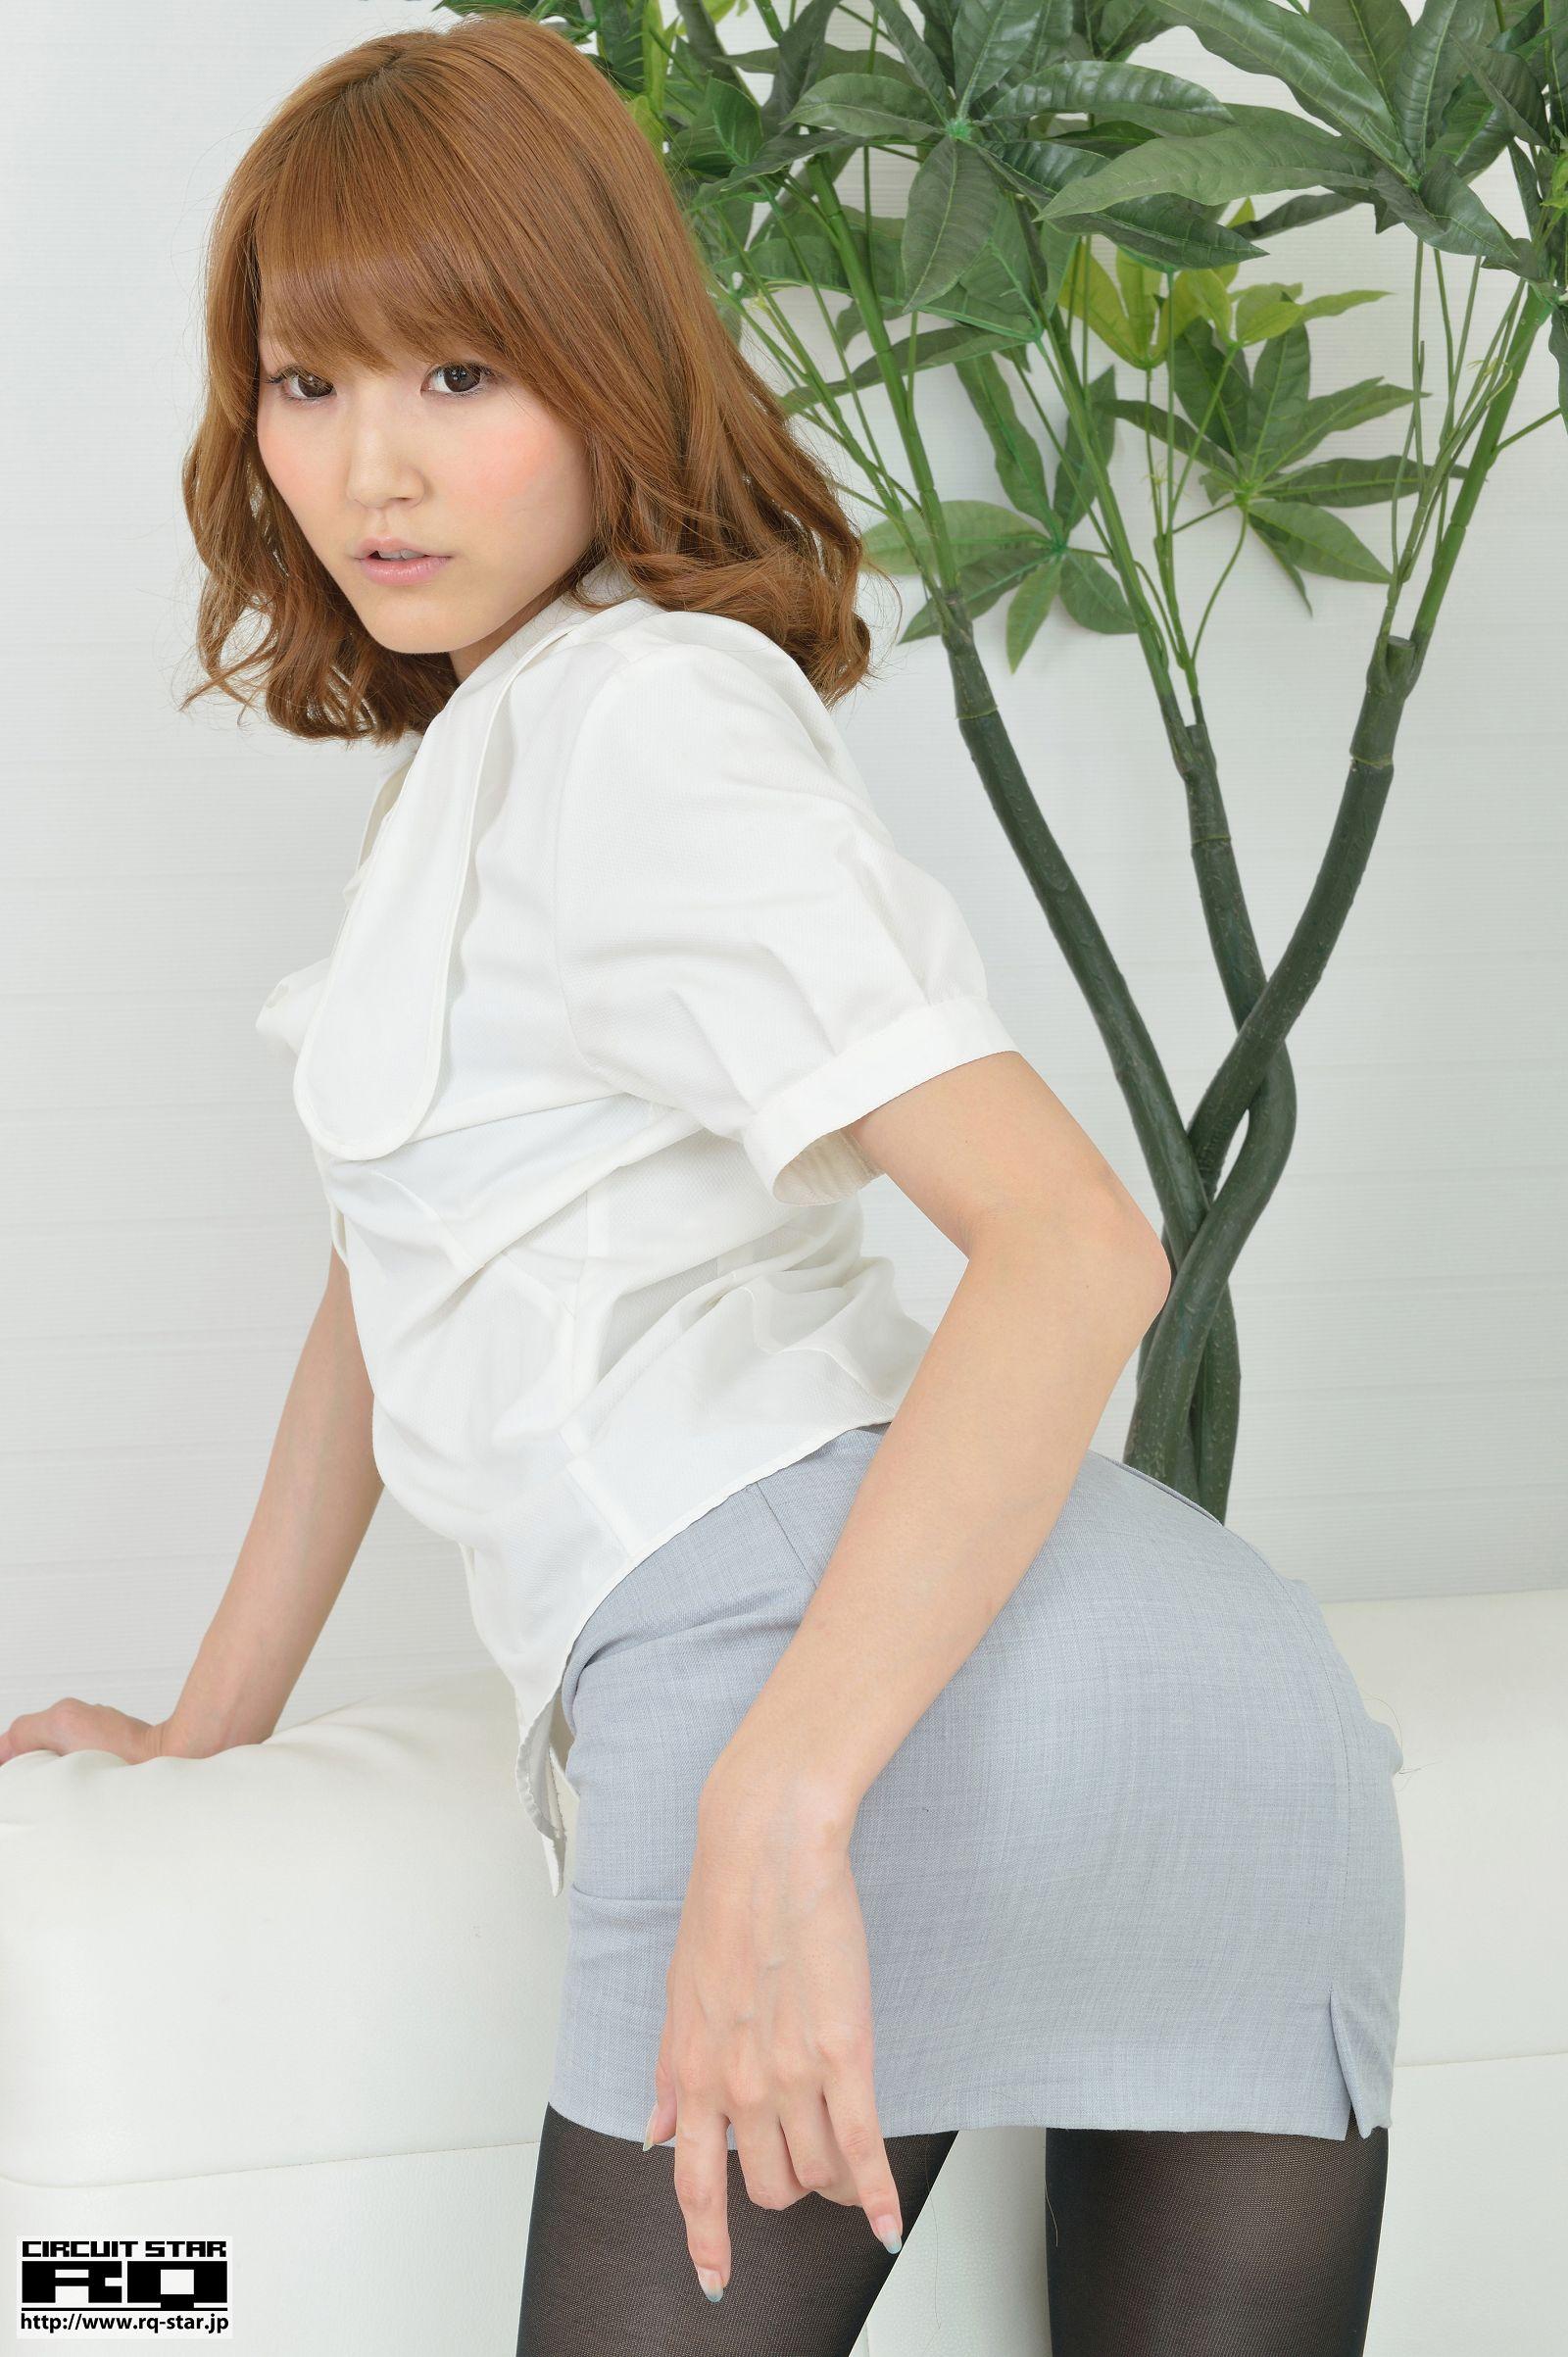 [RQ STAR美女] NO.01057 Aya Matsubayashi 松林彩 Office Lady[105P] RQ STAR 第4张